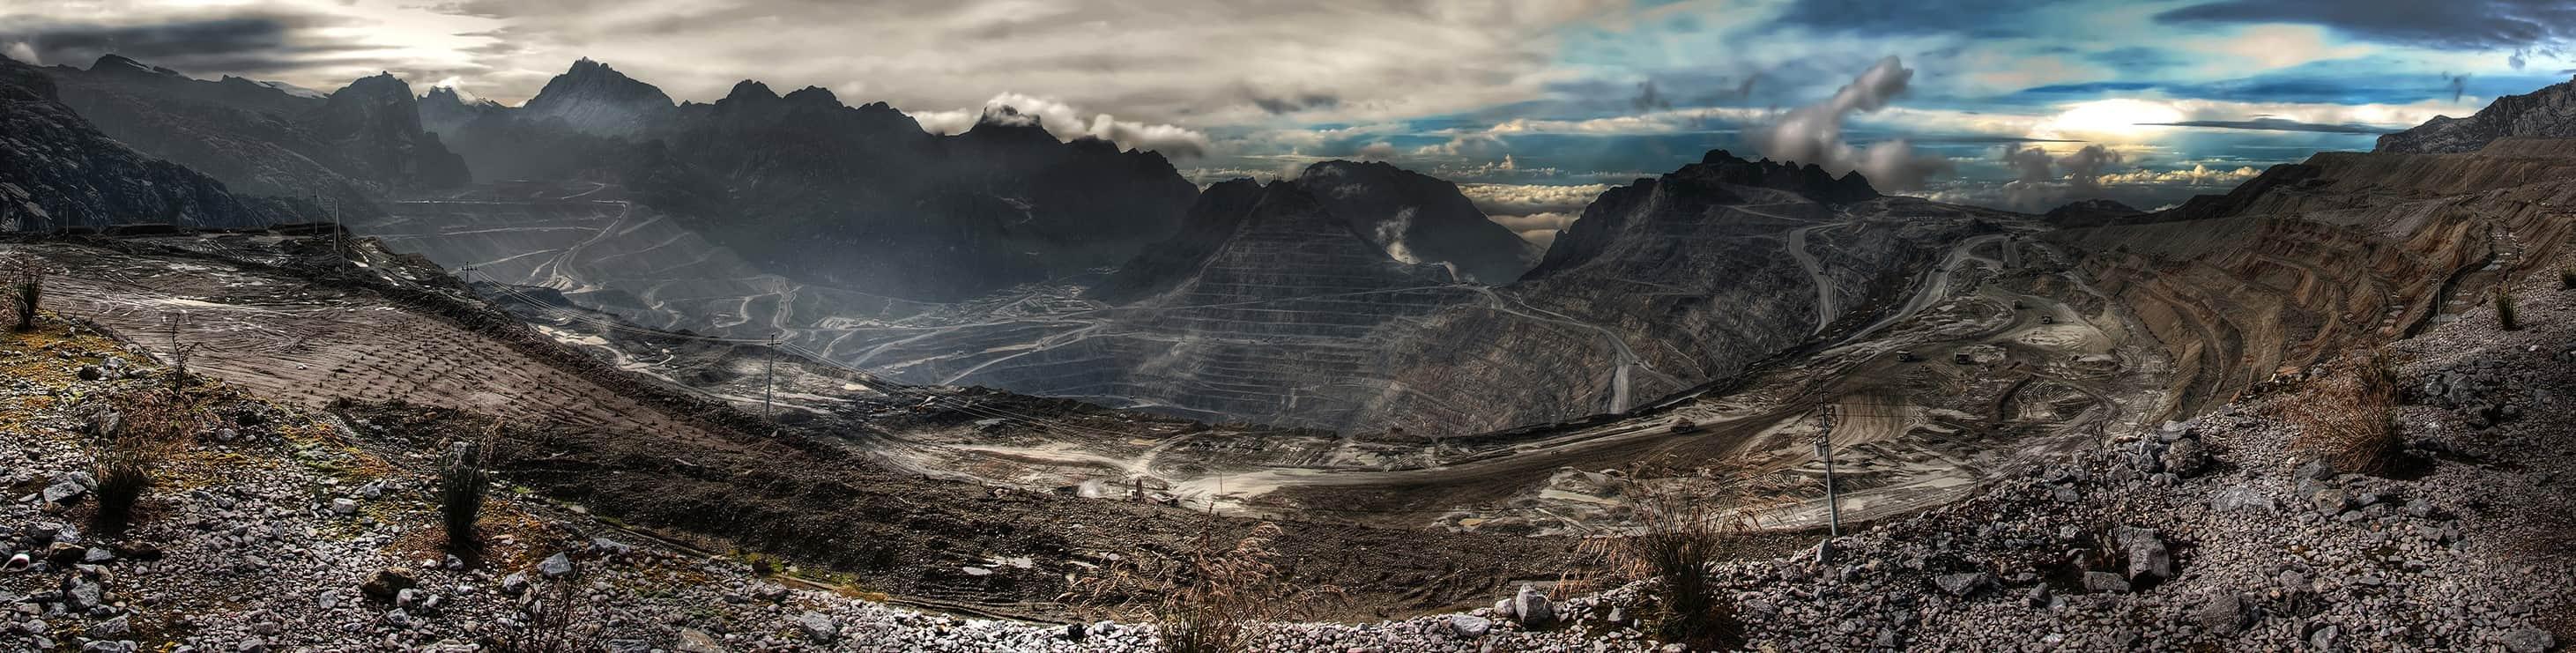 The Grasberg mining complex in 2009 (Photo: Richard Jones/Flickr)